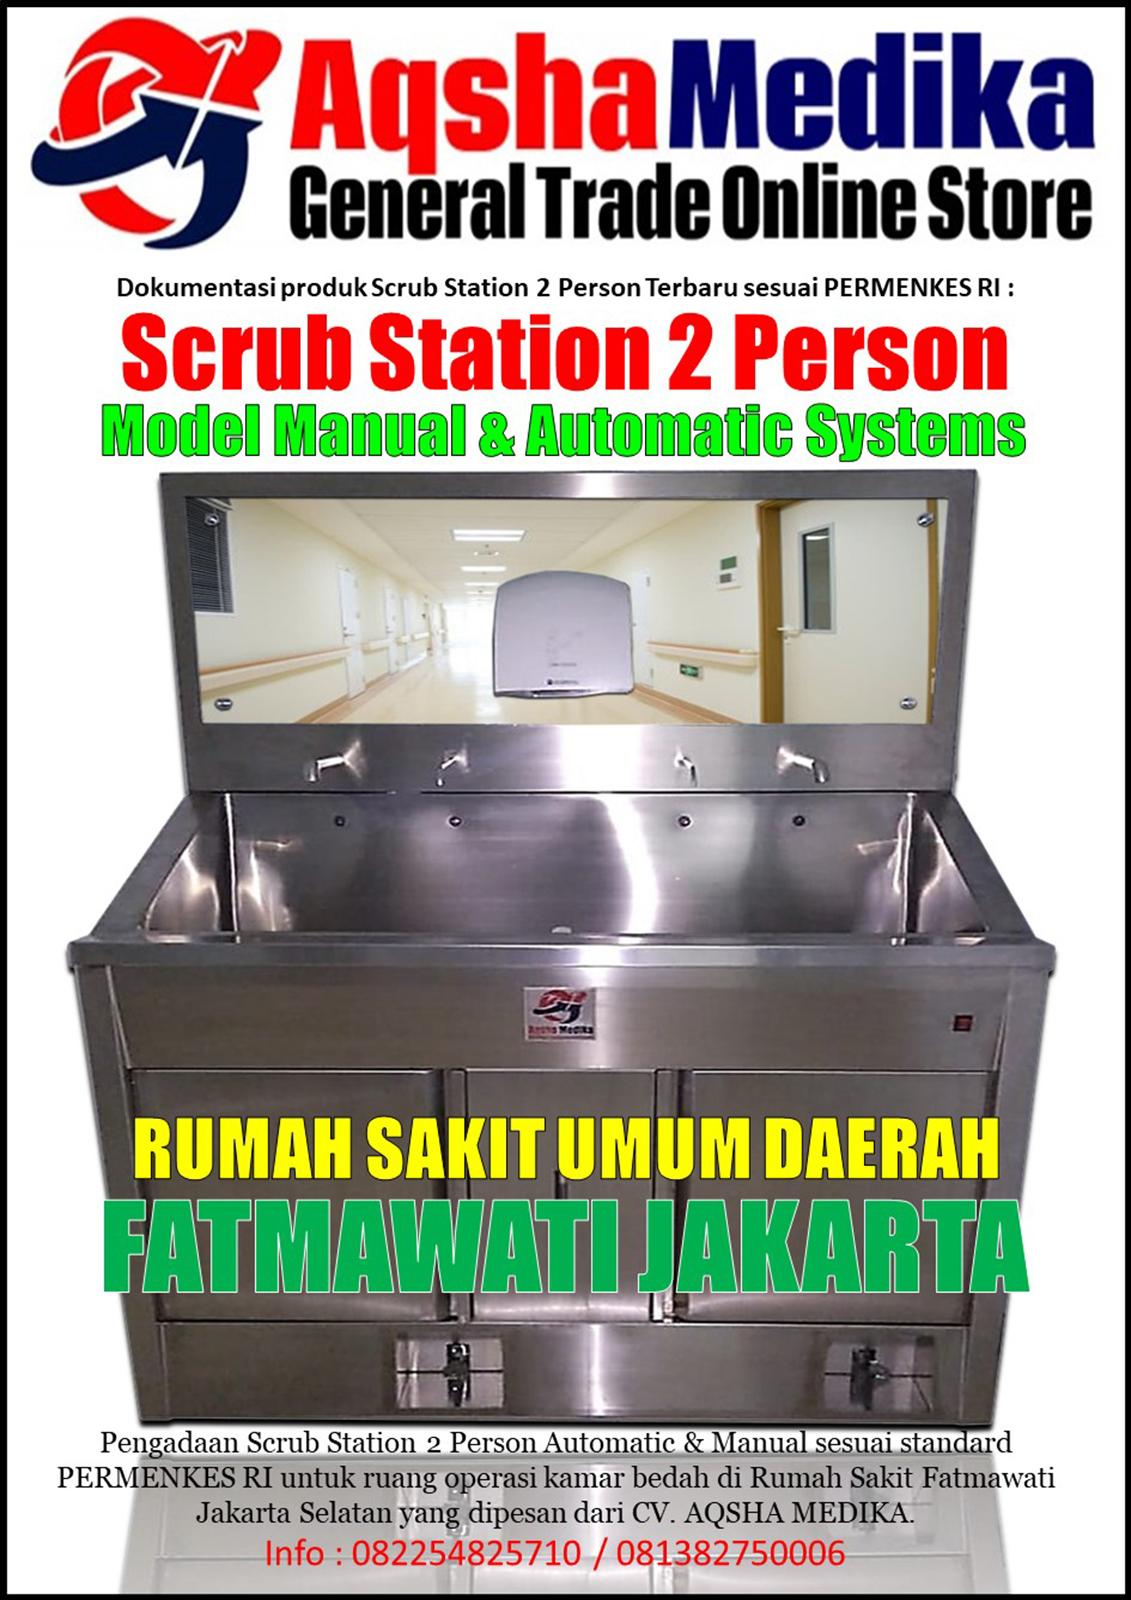 Mesin Scrub Station 2 Person Automatic Manual RSUD Fatmawati Jakarta